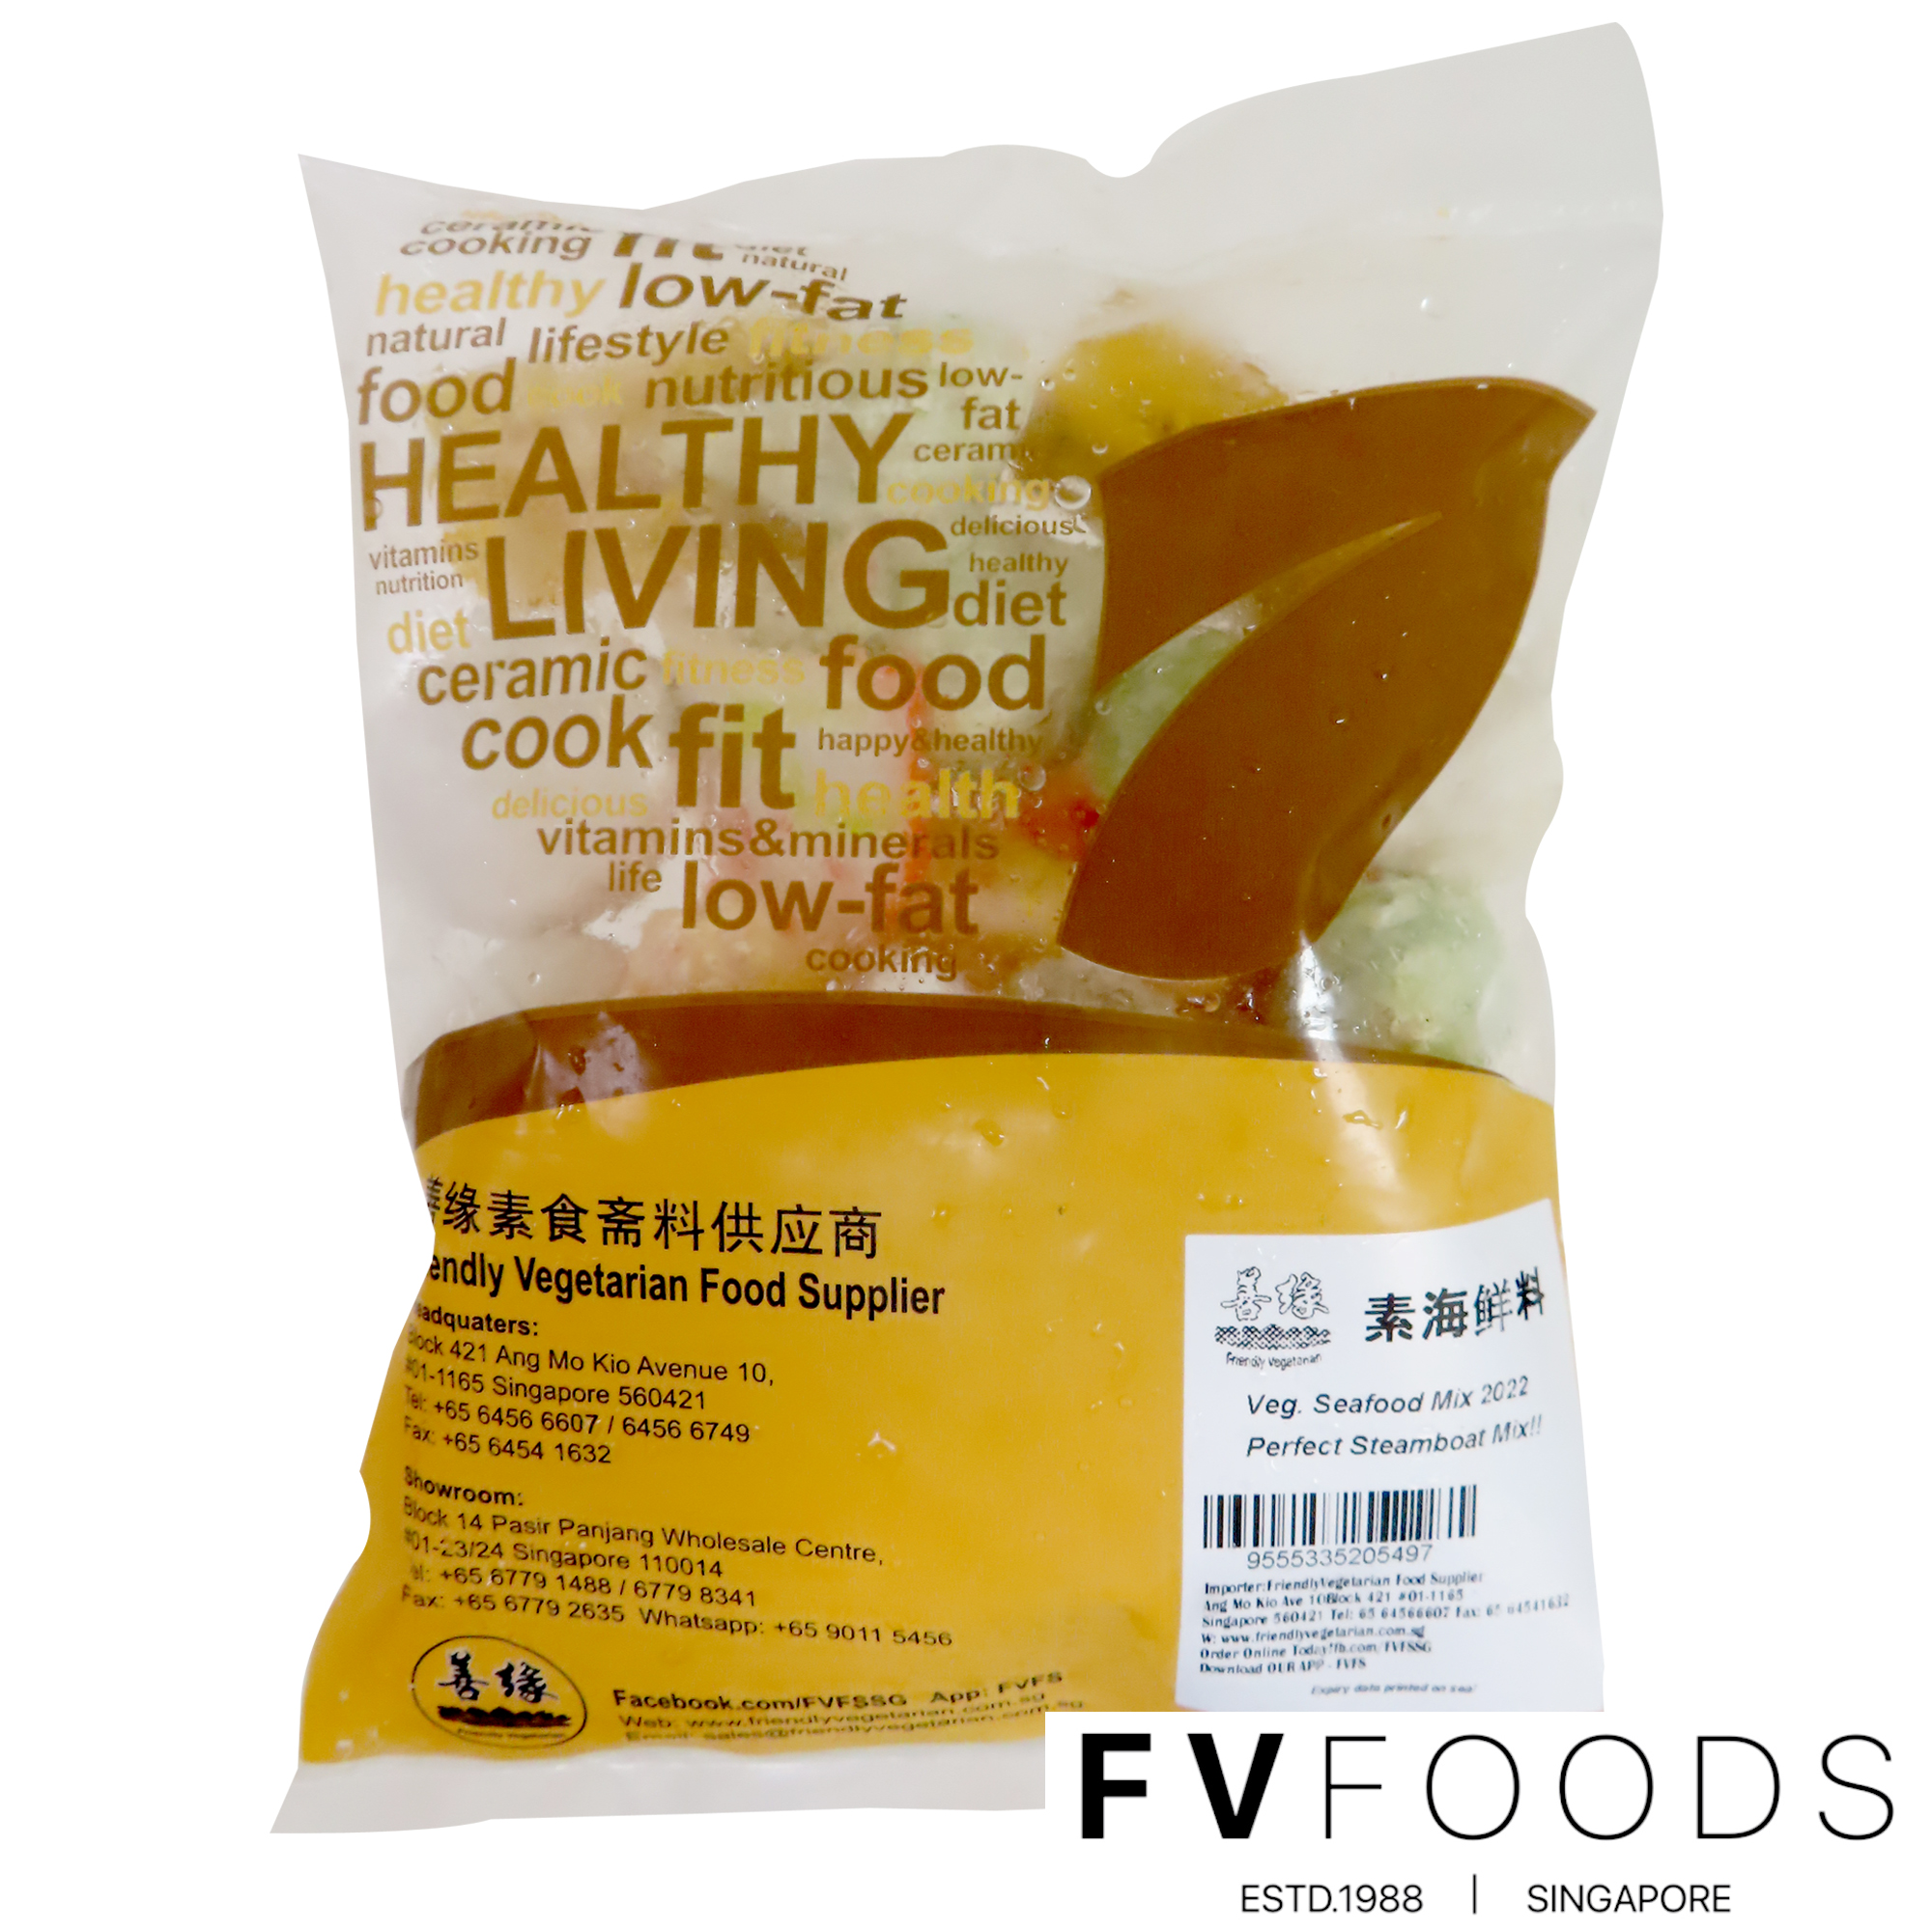 Image Veg Seafood Mix 善缘 - 海鲜料 500grams